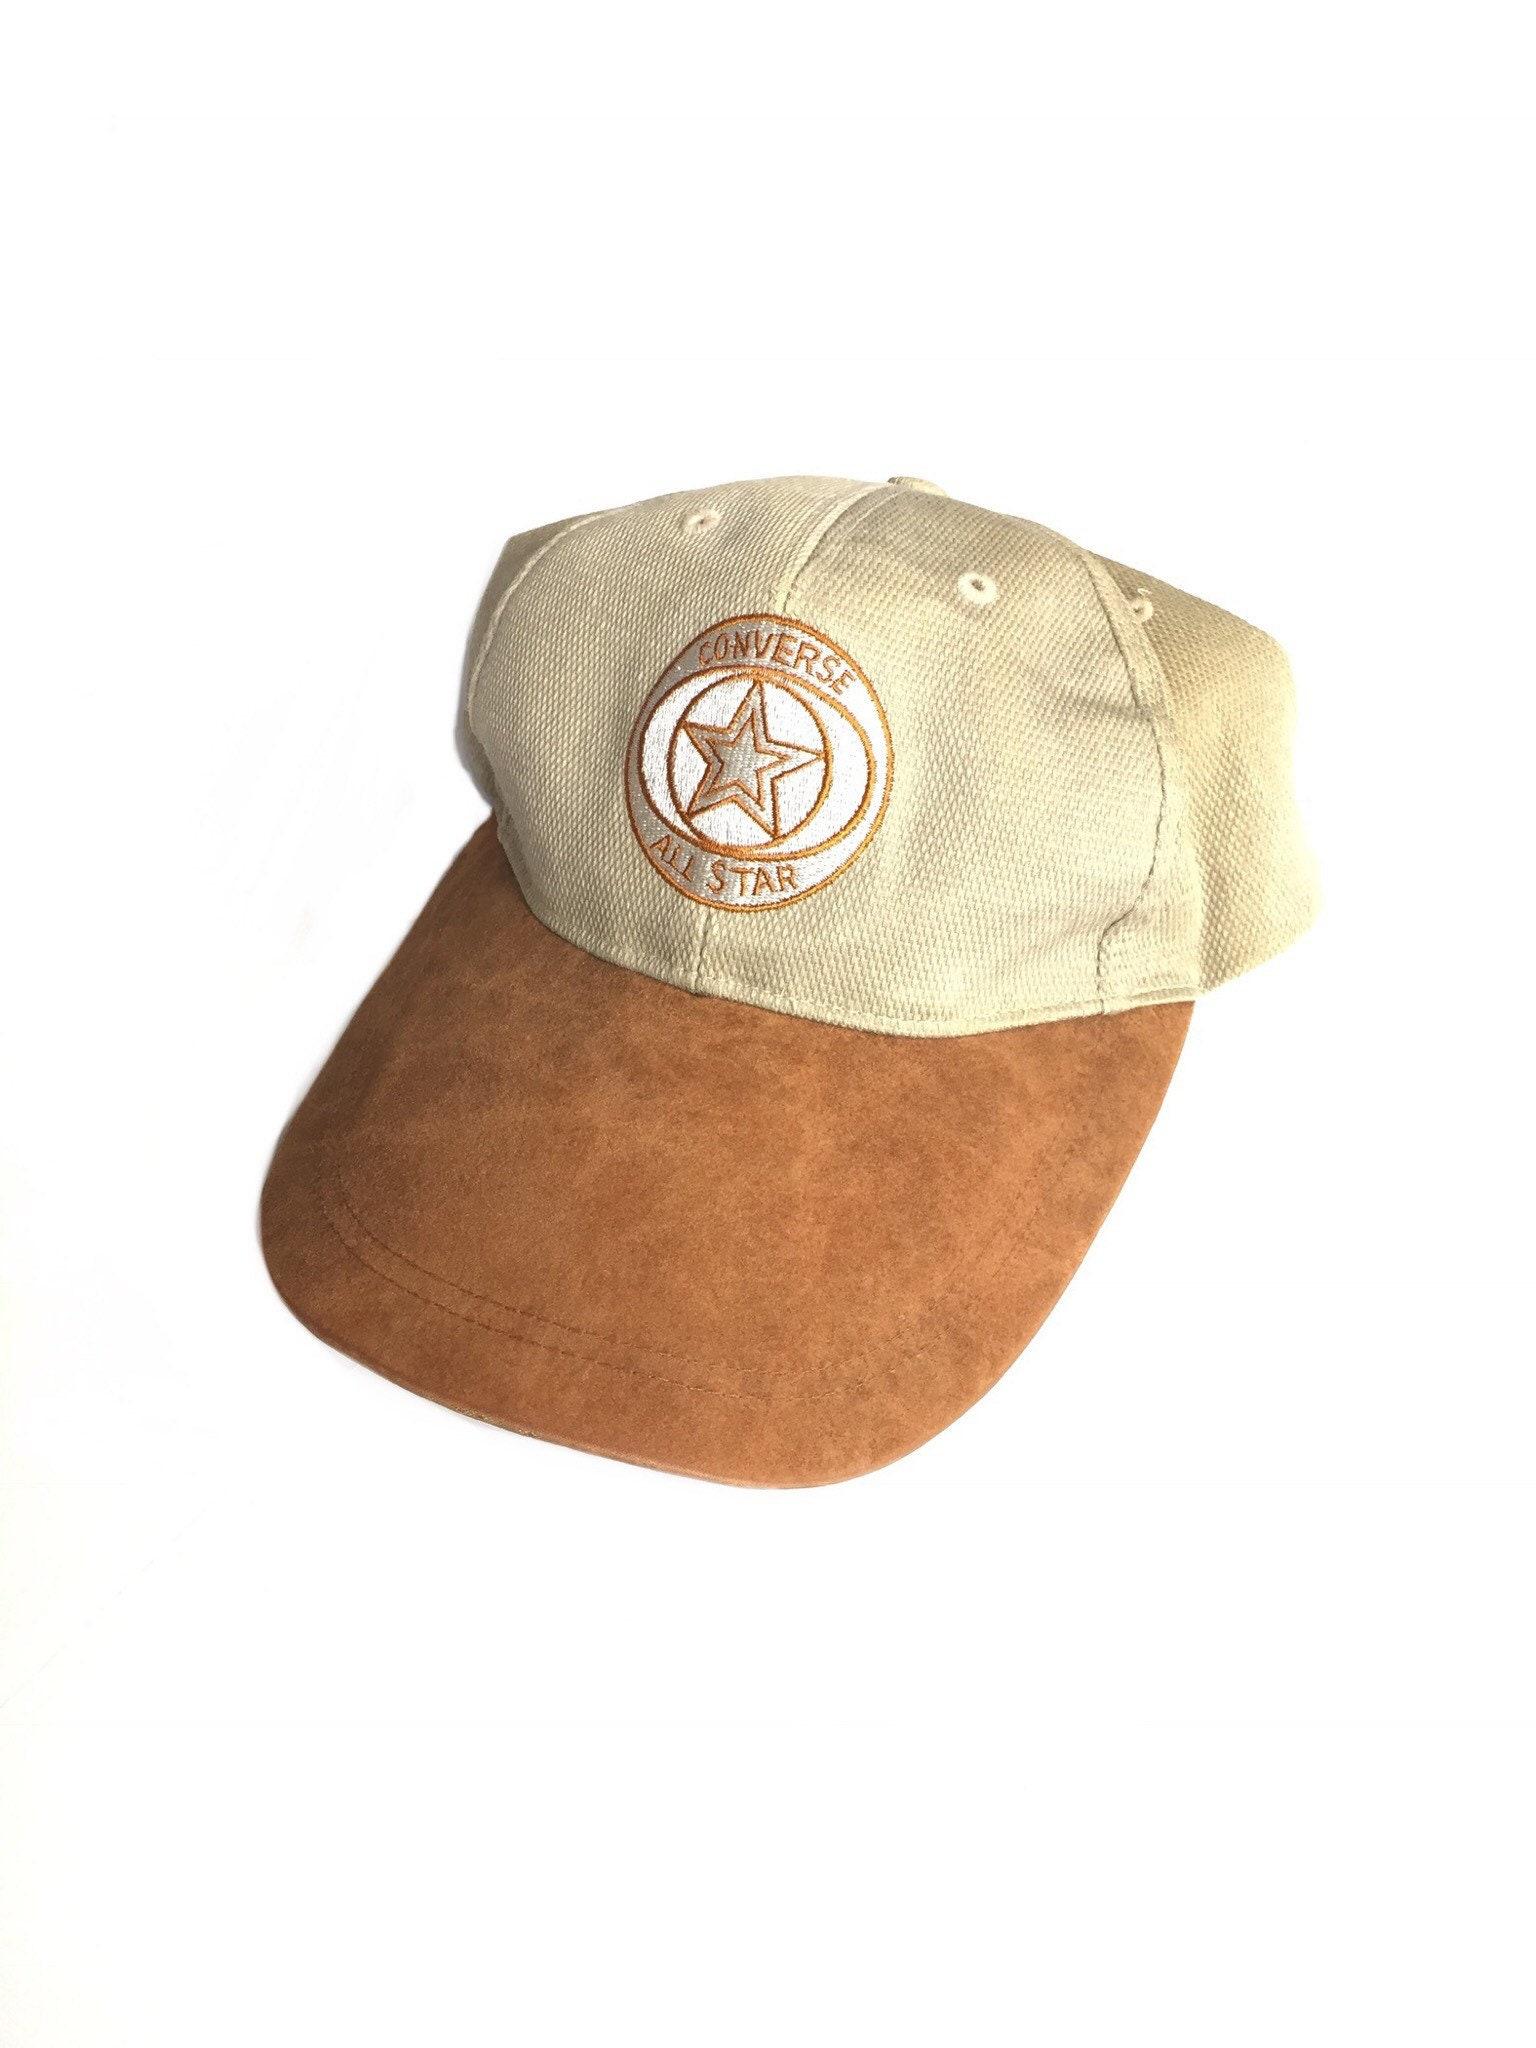 969fc1d9512 Vintage 90s chuck taylor converse snapback hat canvas suede